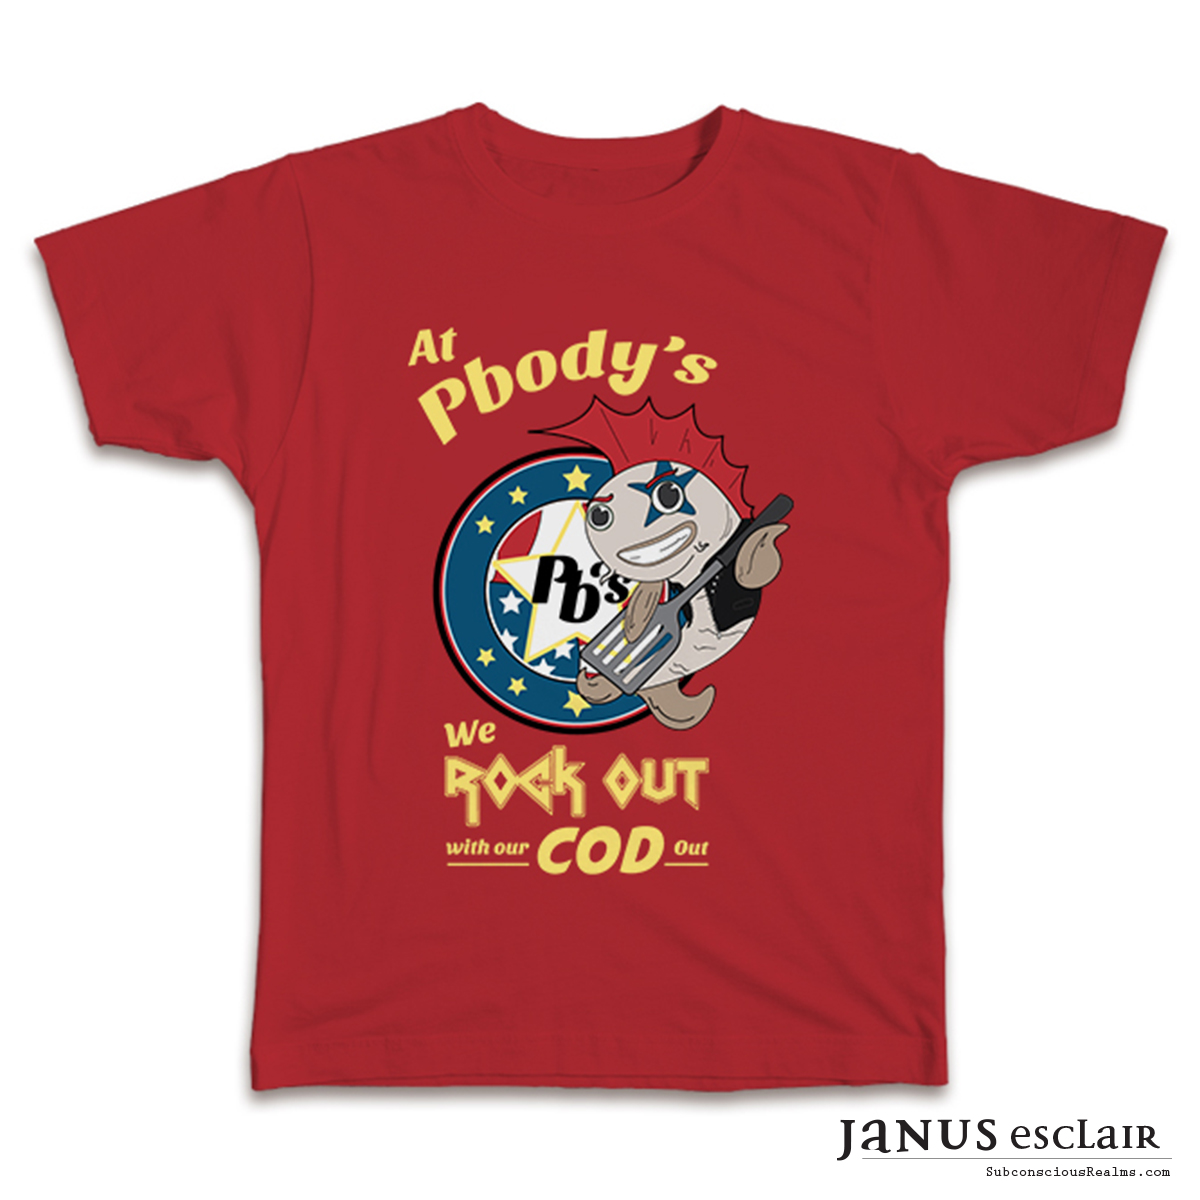 Pbody's - T-Shirt Designs